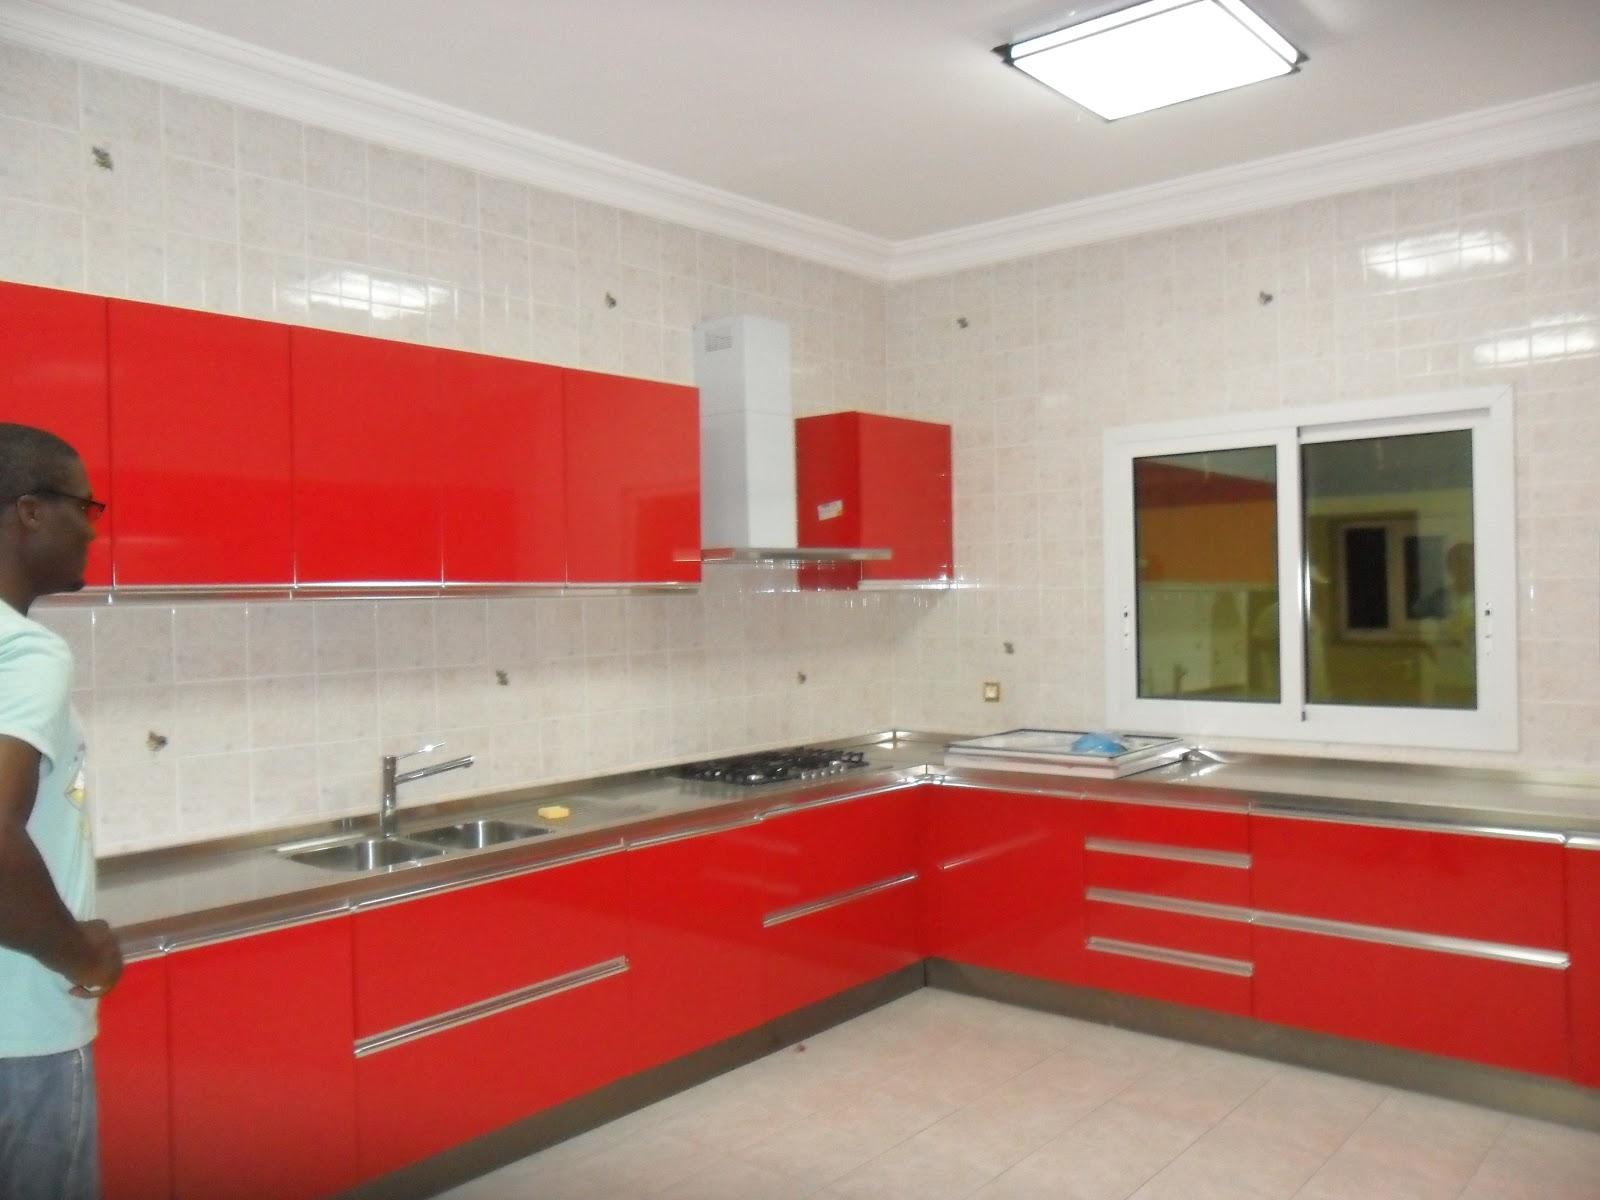 Immobilis cameroun villa duplex a vendre sur bastos dragages for Grande cuisine equipee